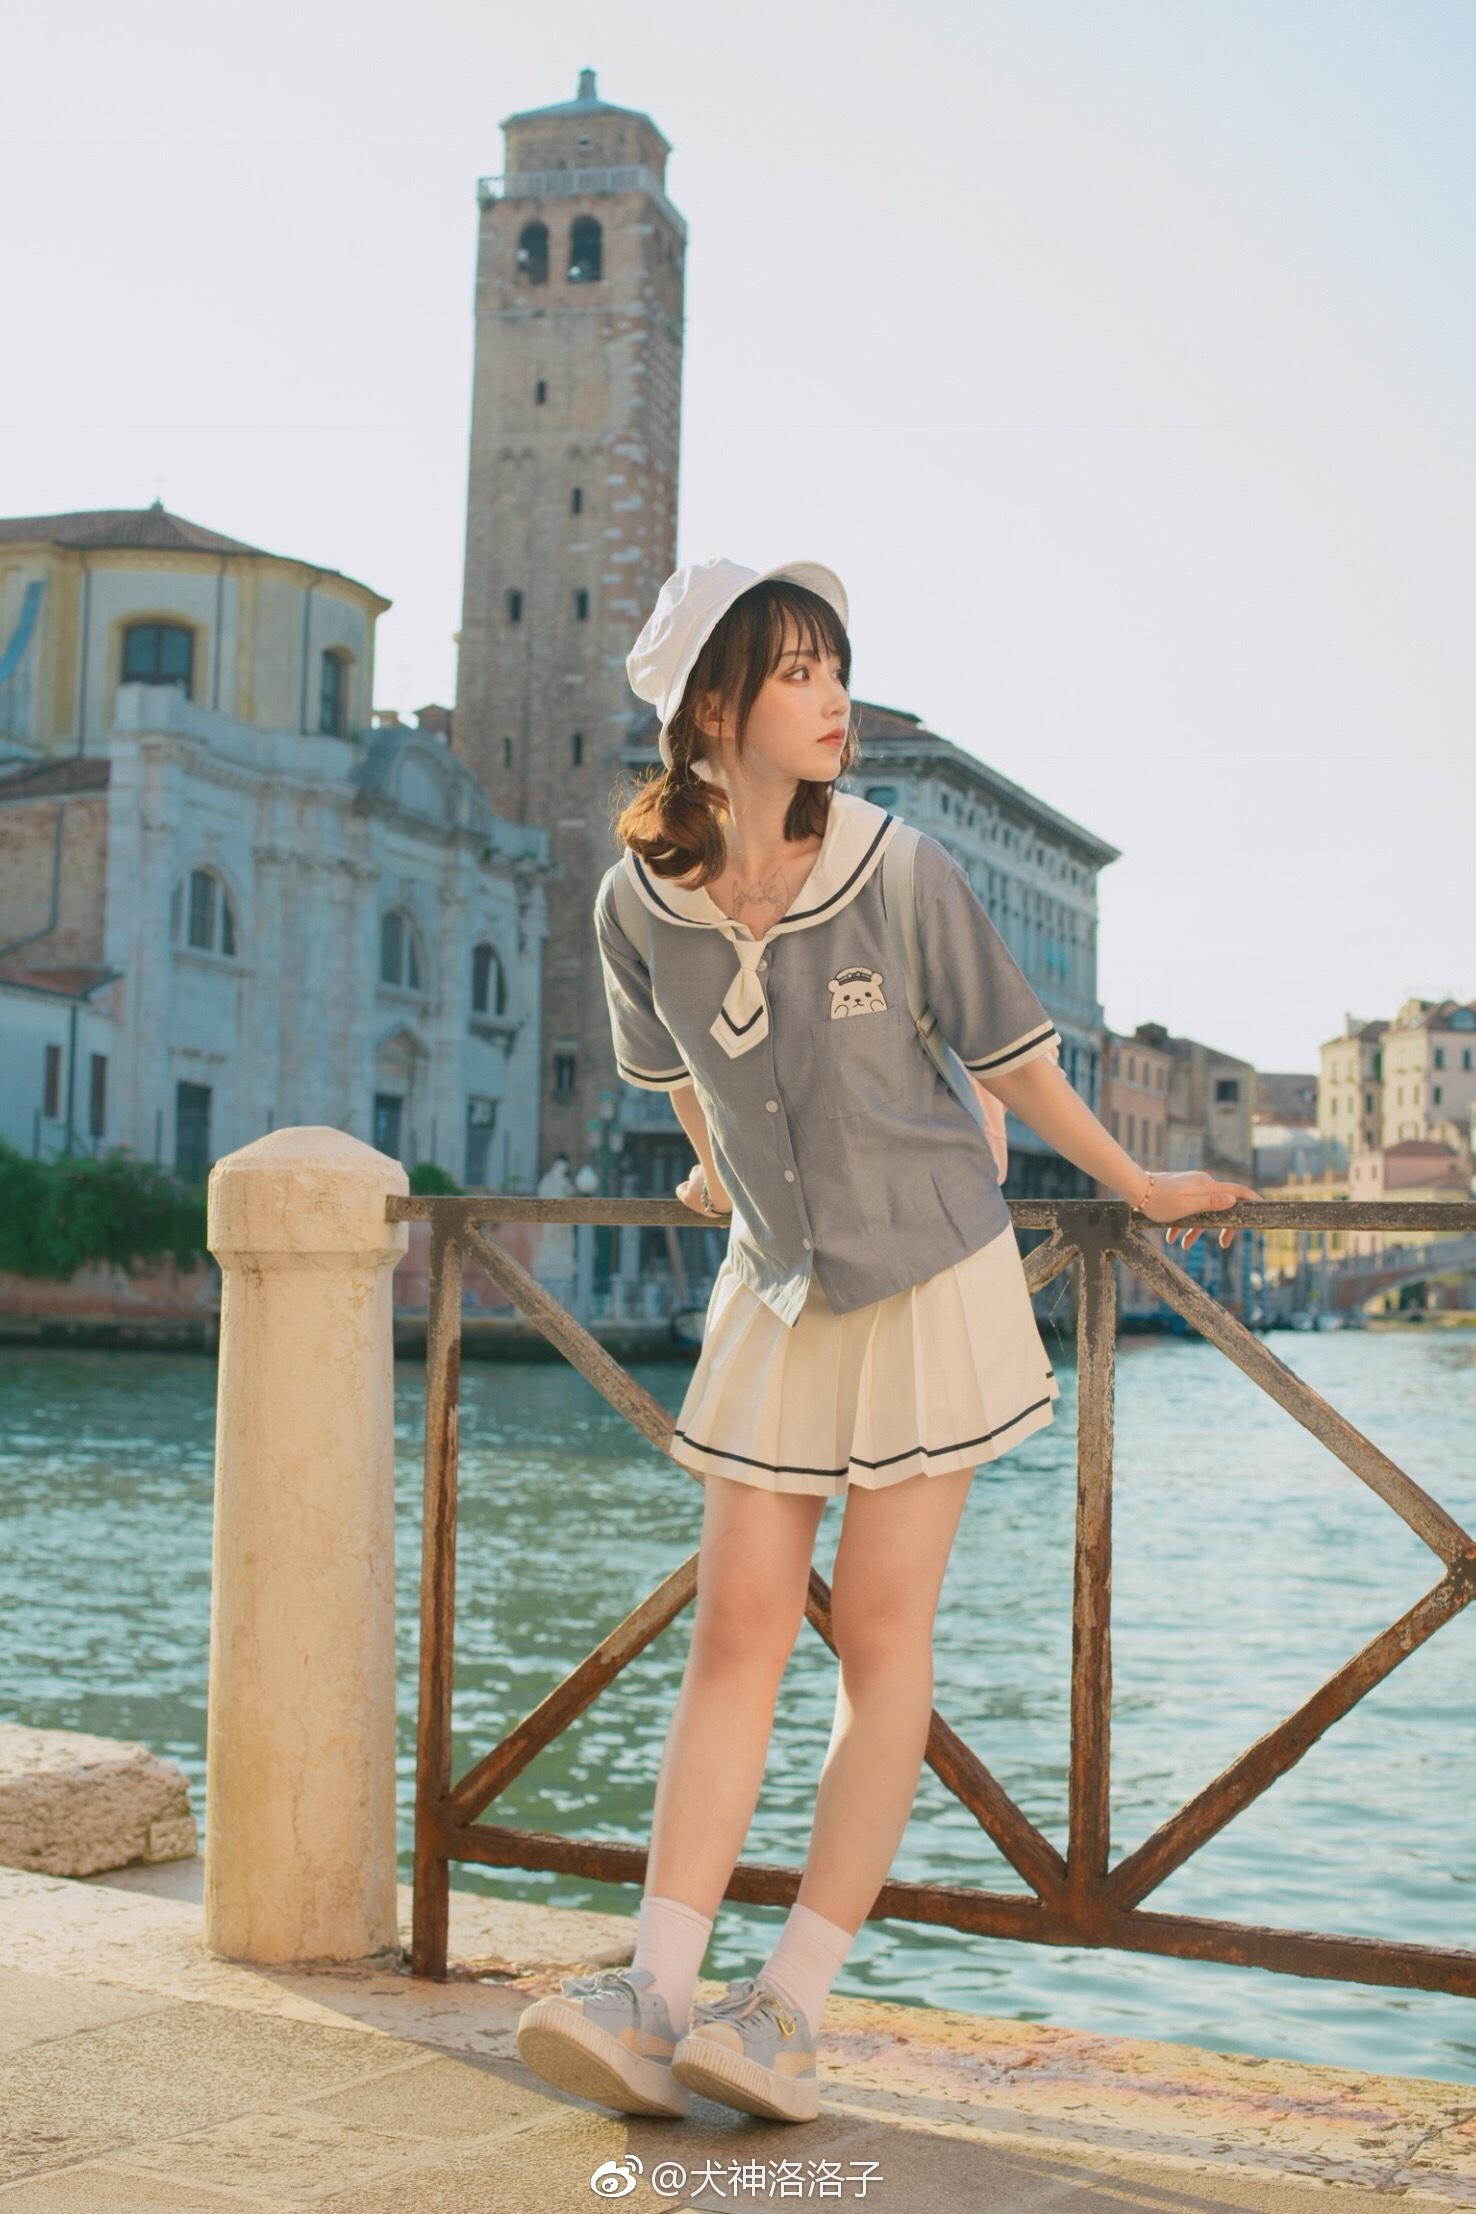 Venezia Girl插图2